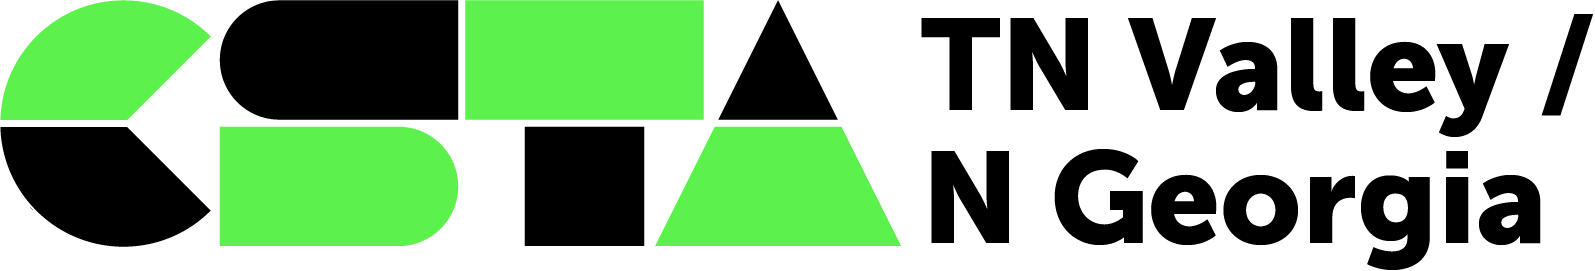 TN Valley / N Georgia  logo